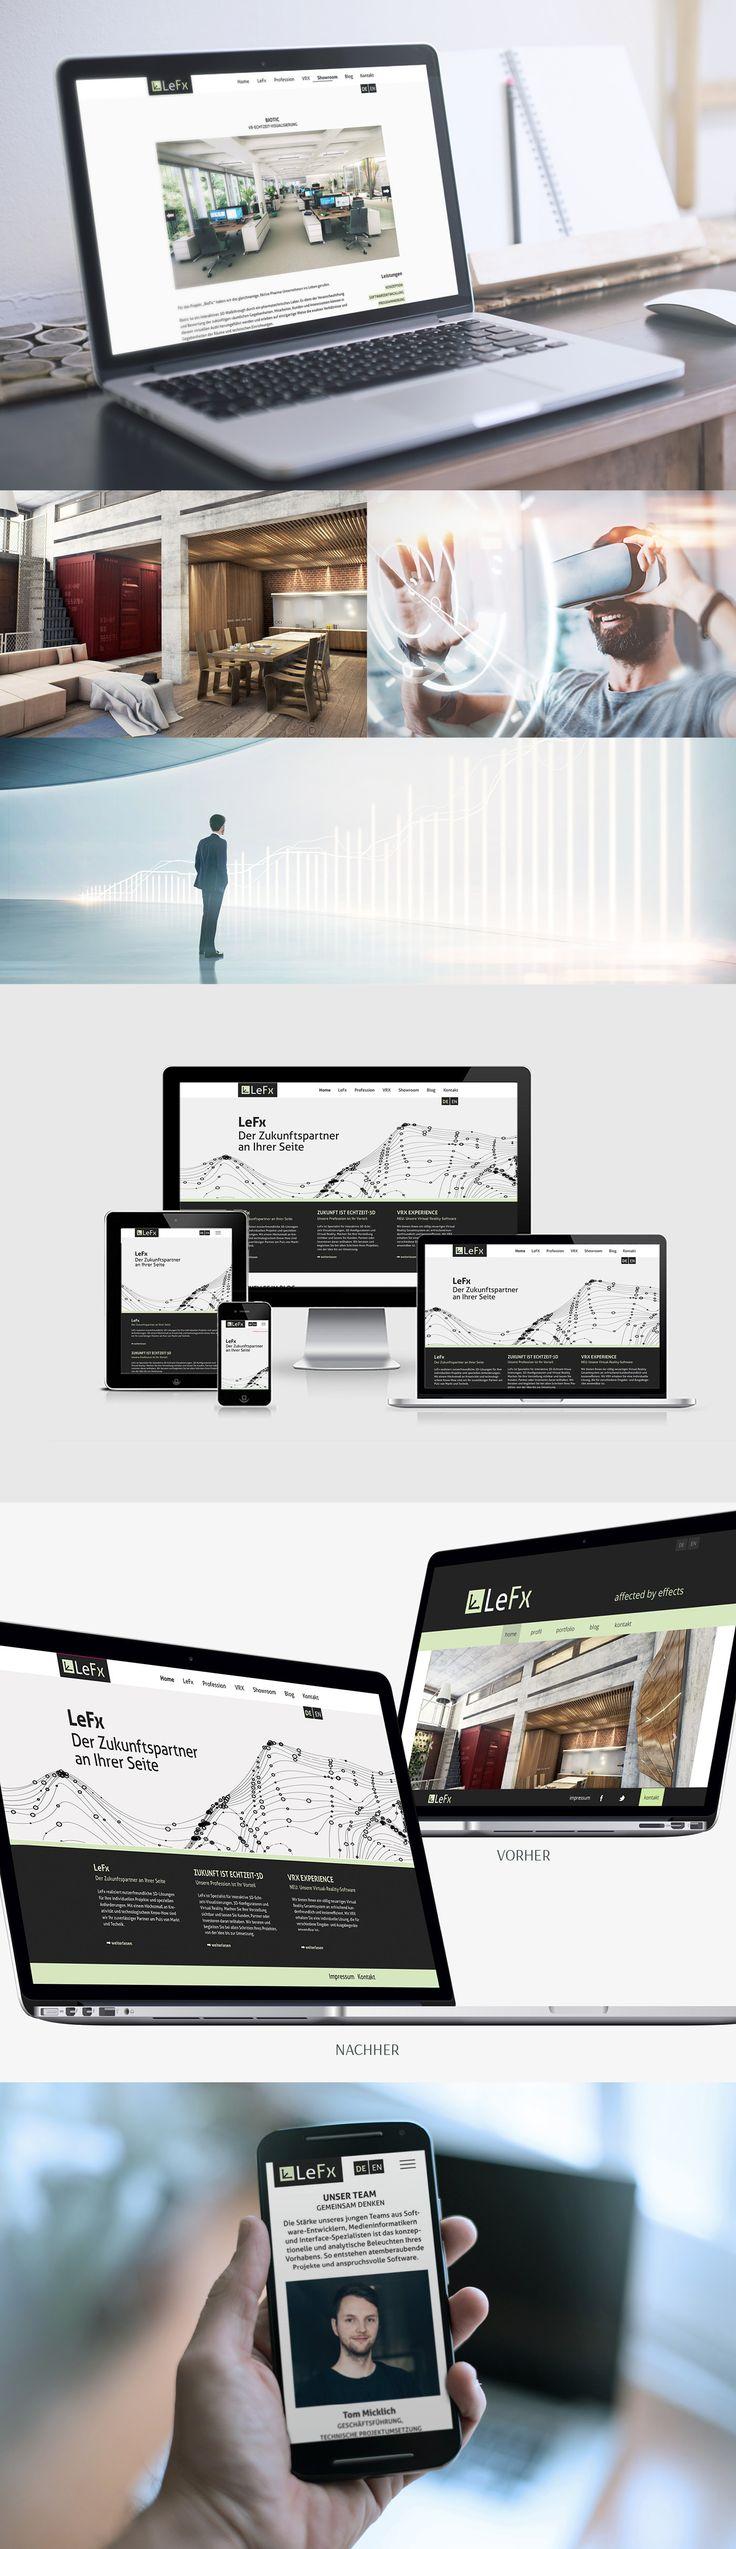 Zitronengrau Leipzig Webdesign Redesign LeFx